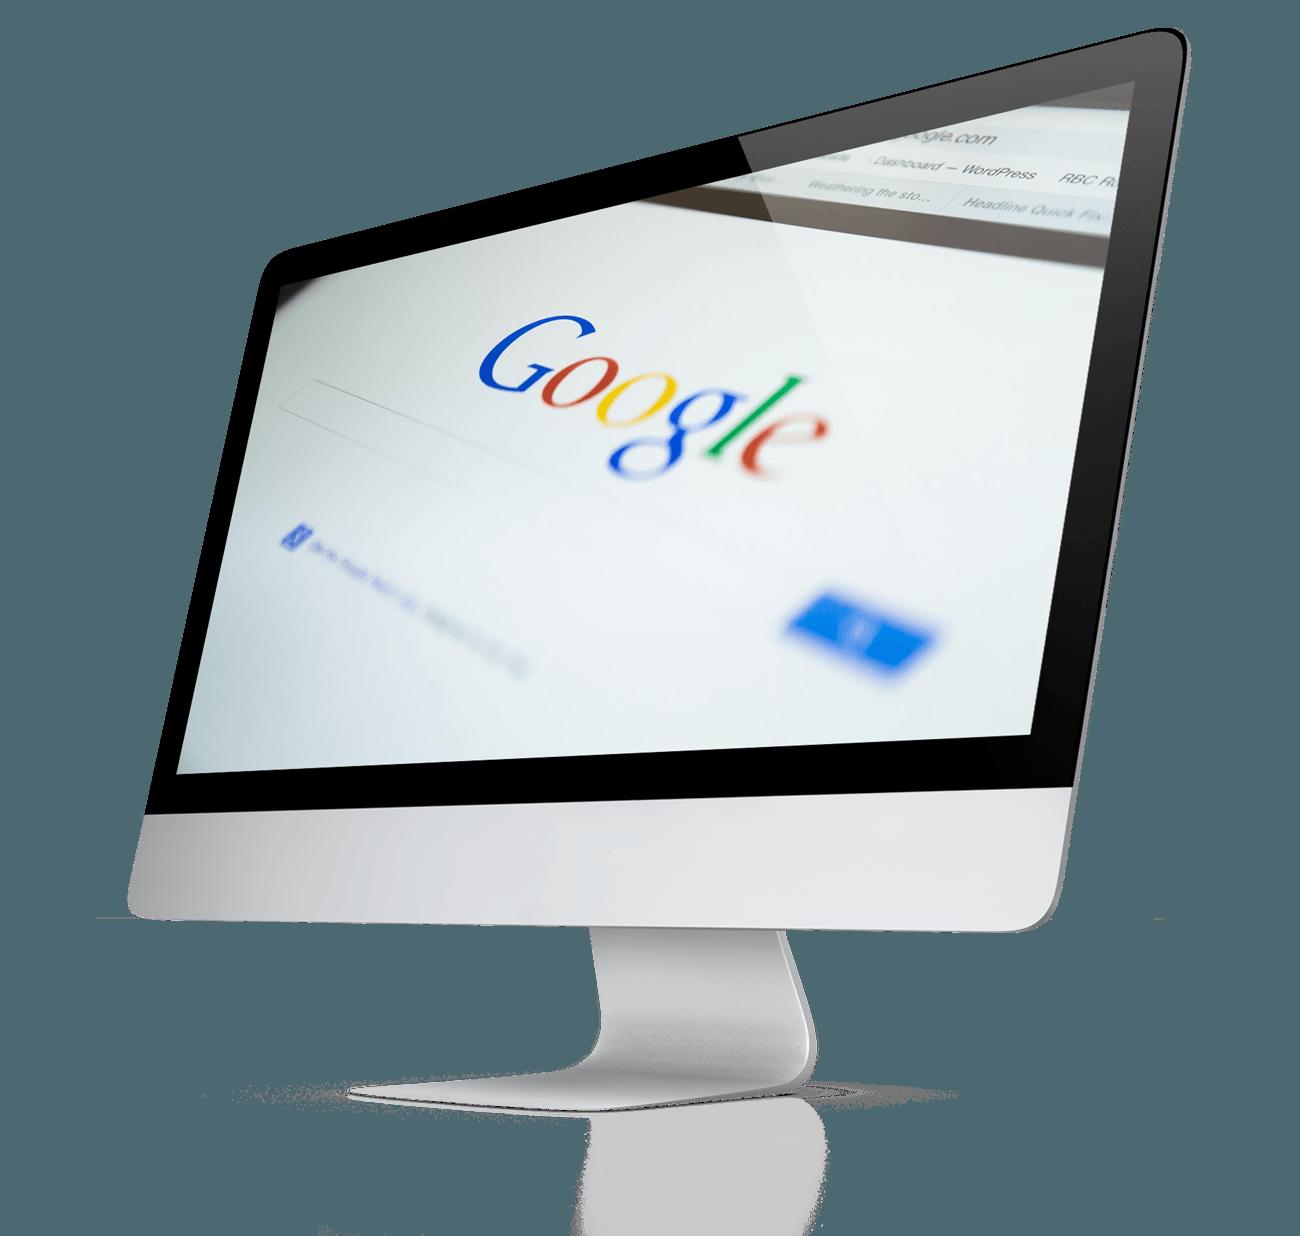 Image of Mac with Google search splash screen